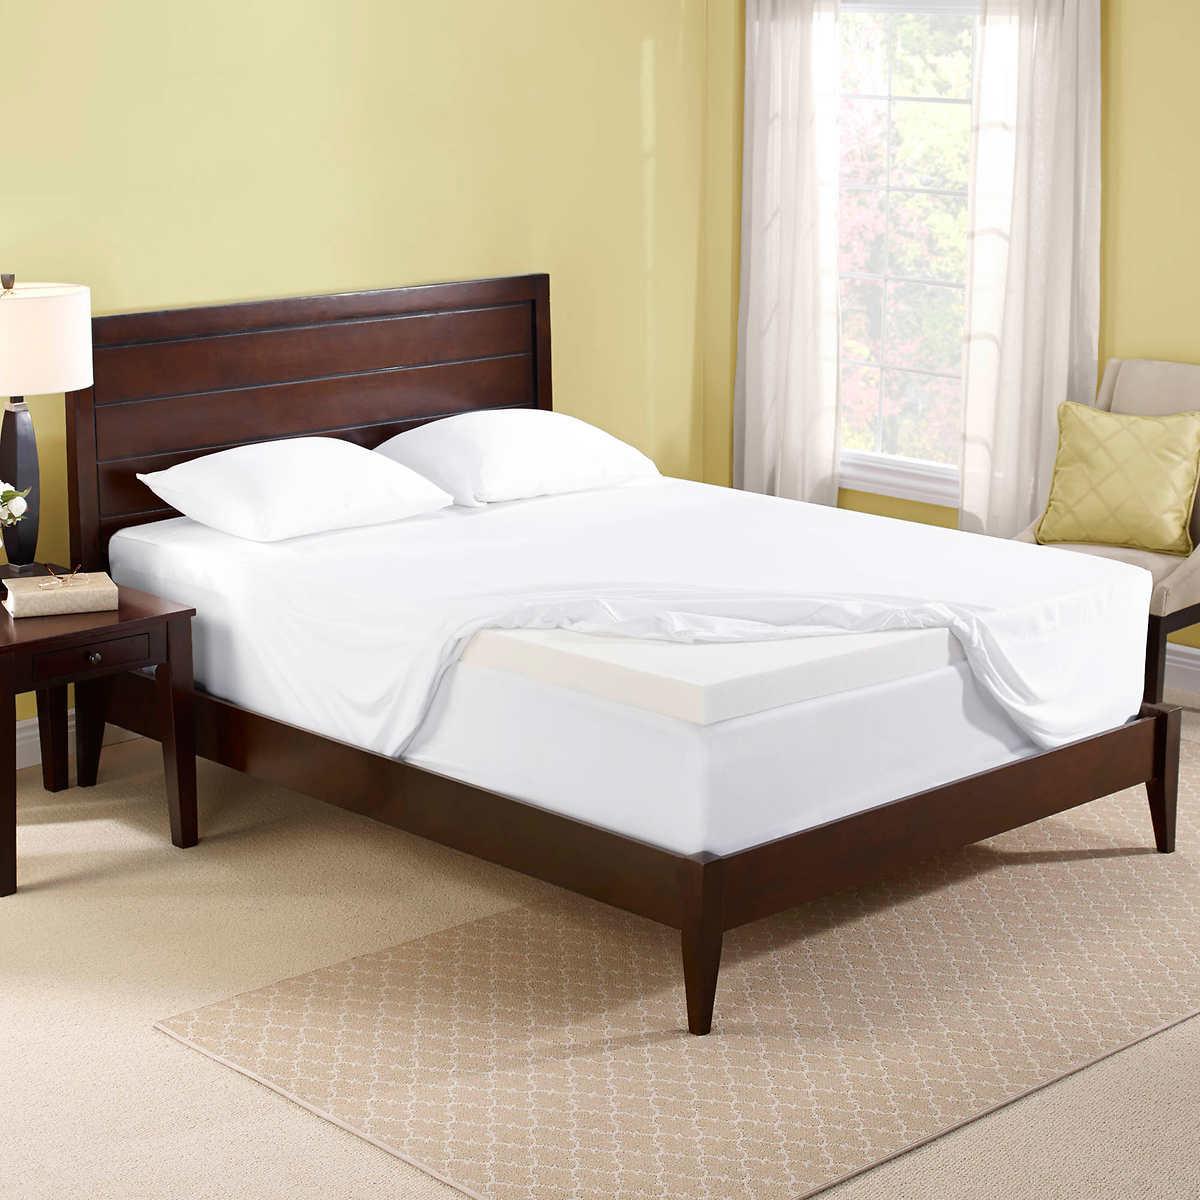 memory topper kitchen queen dining mattress price dp pad com amazon best foam inch